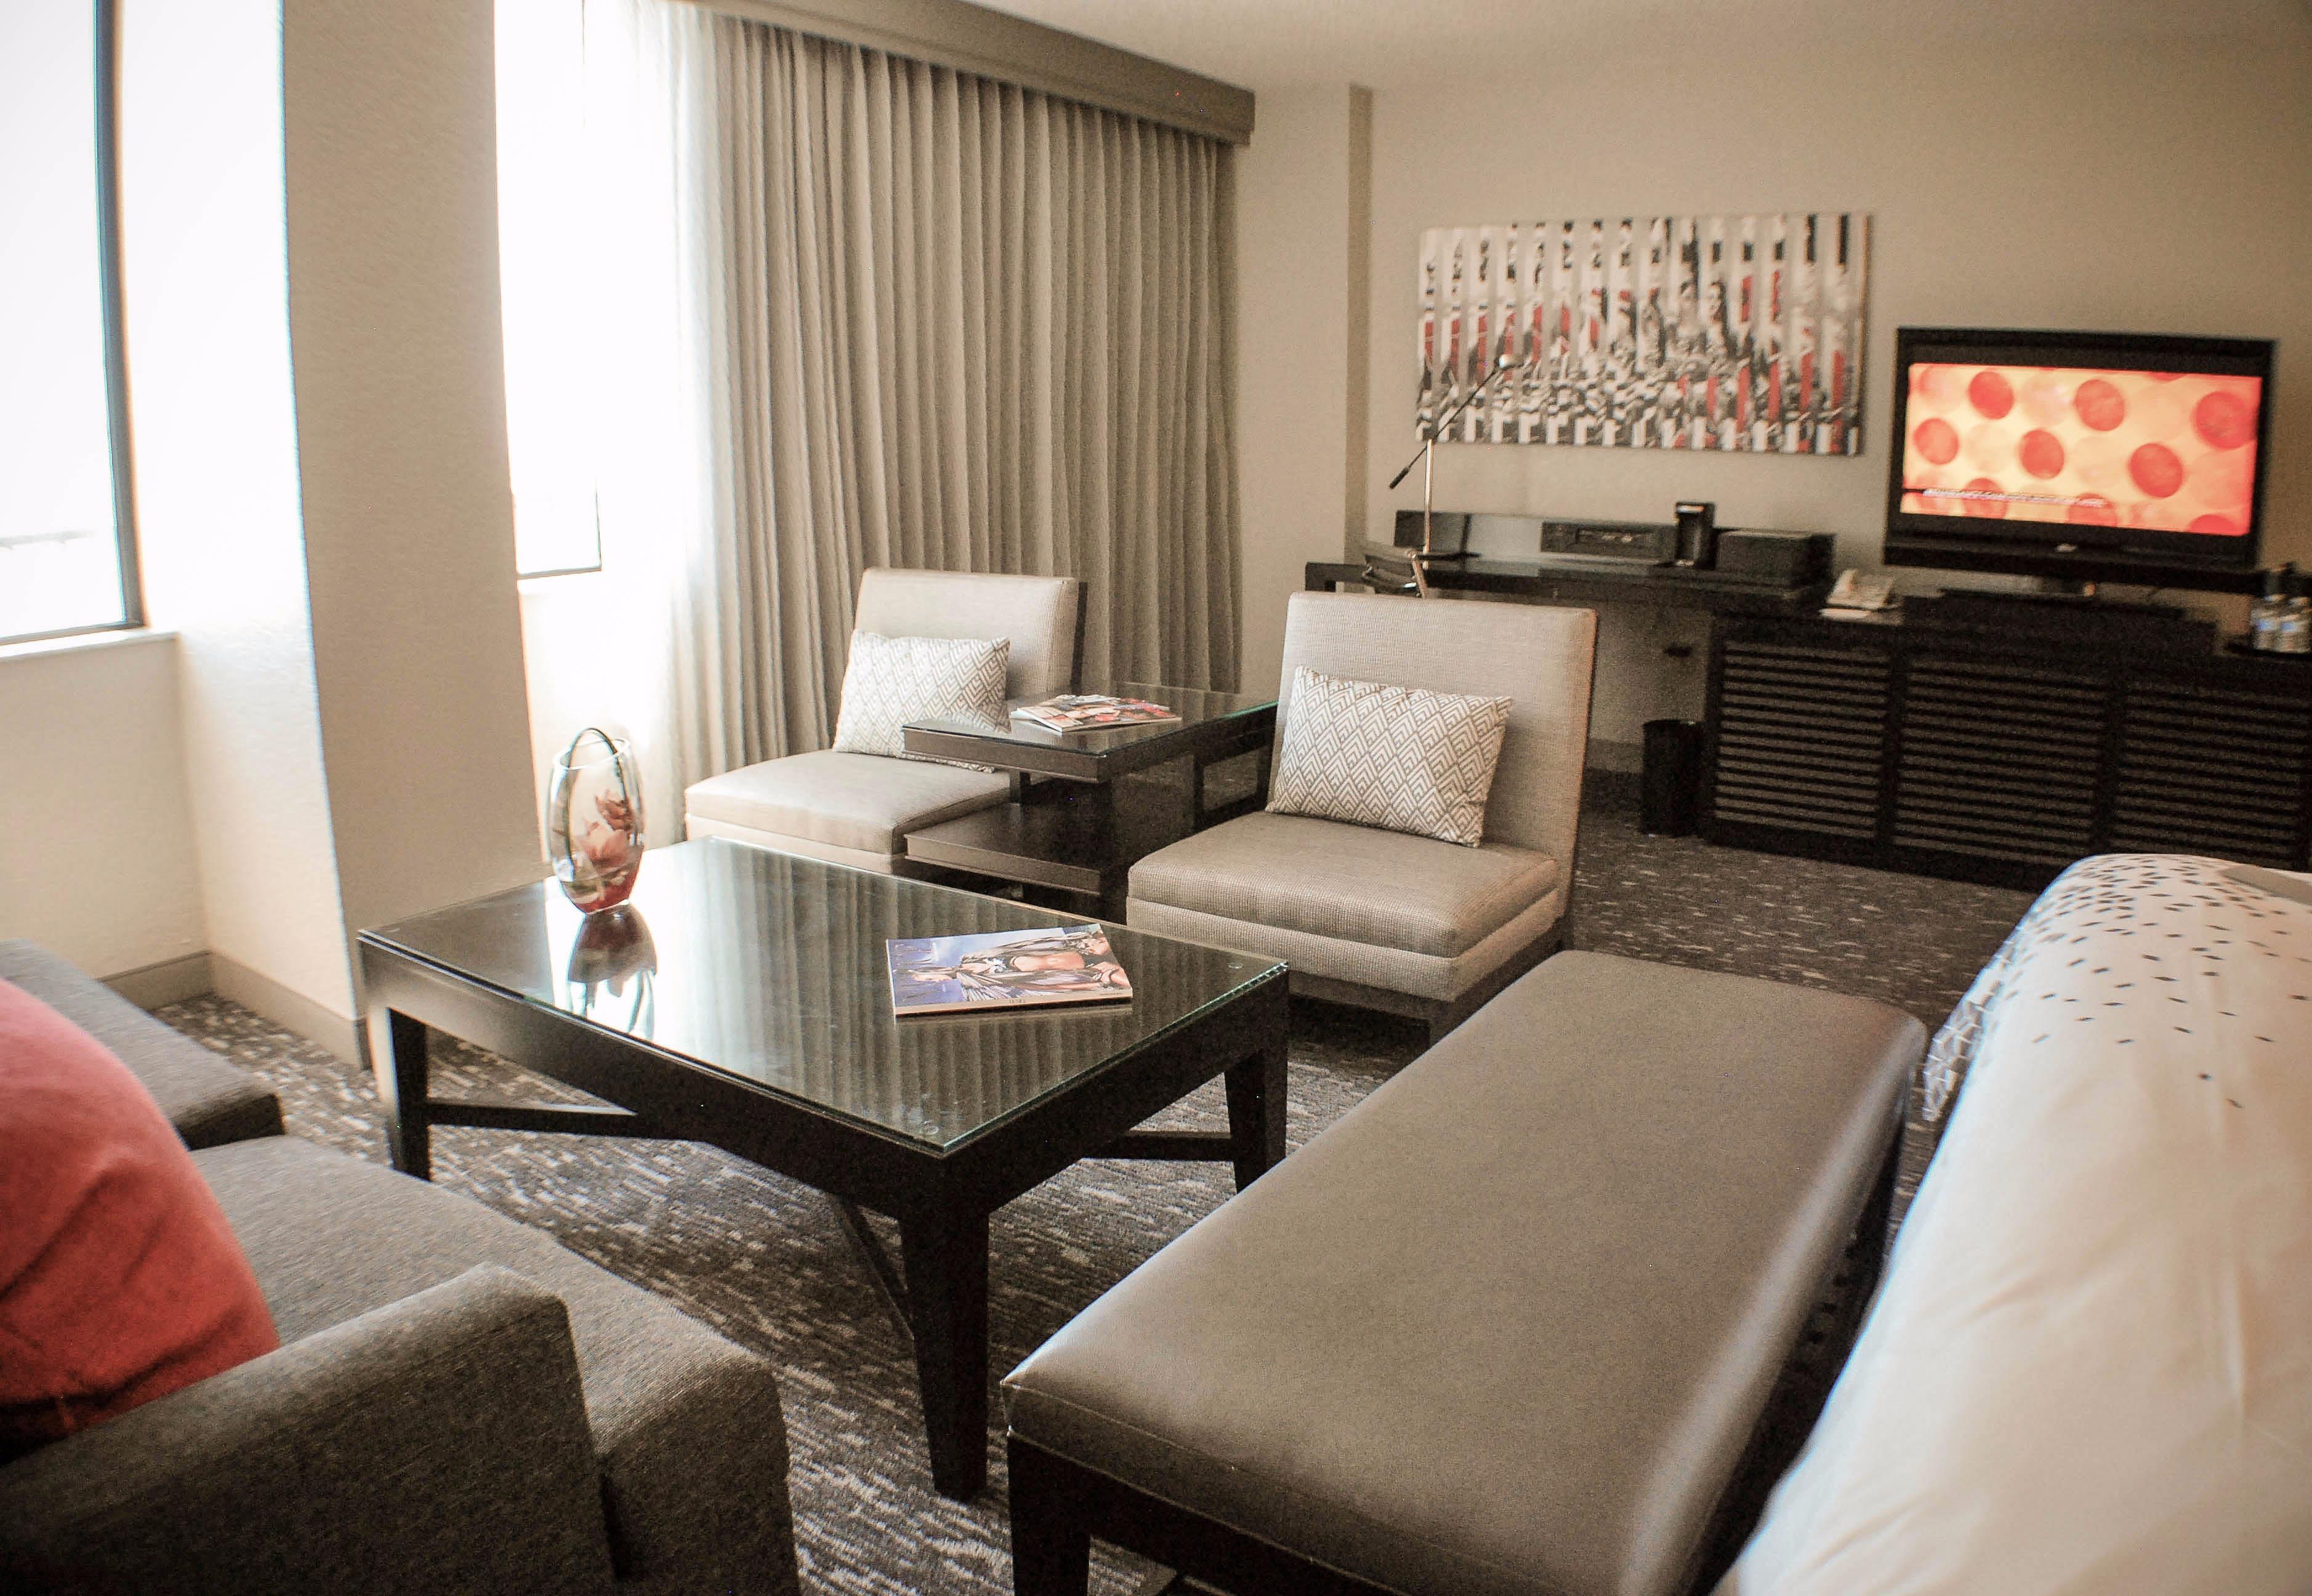 Renaissance Fort Lauderdale Cruise Port Hotel image 12